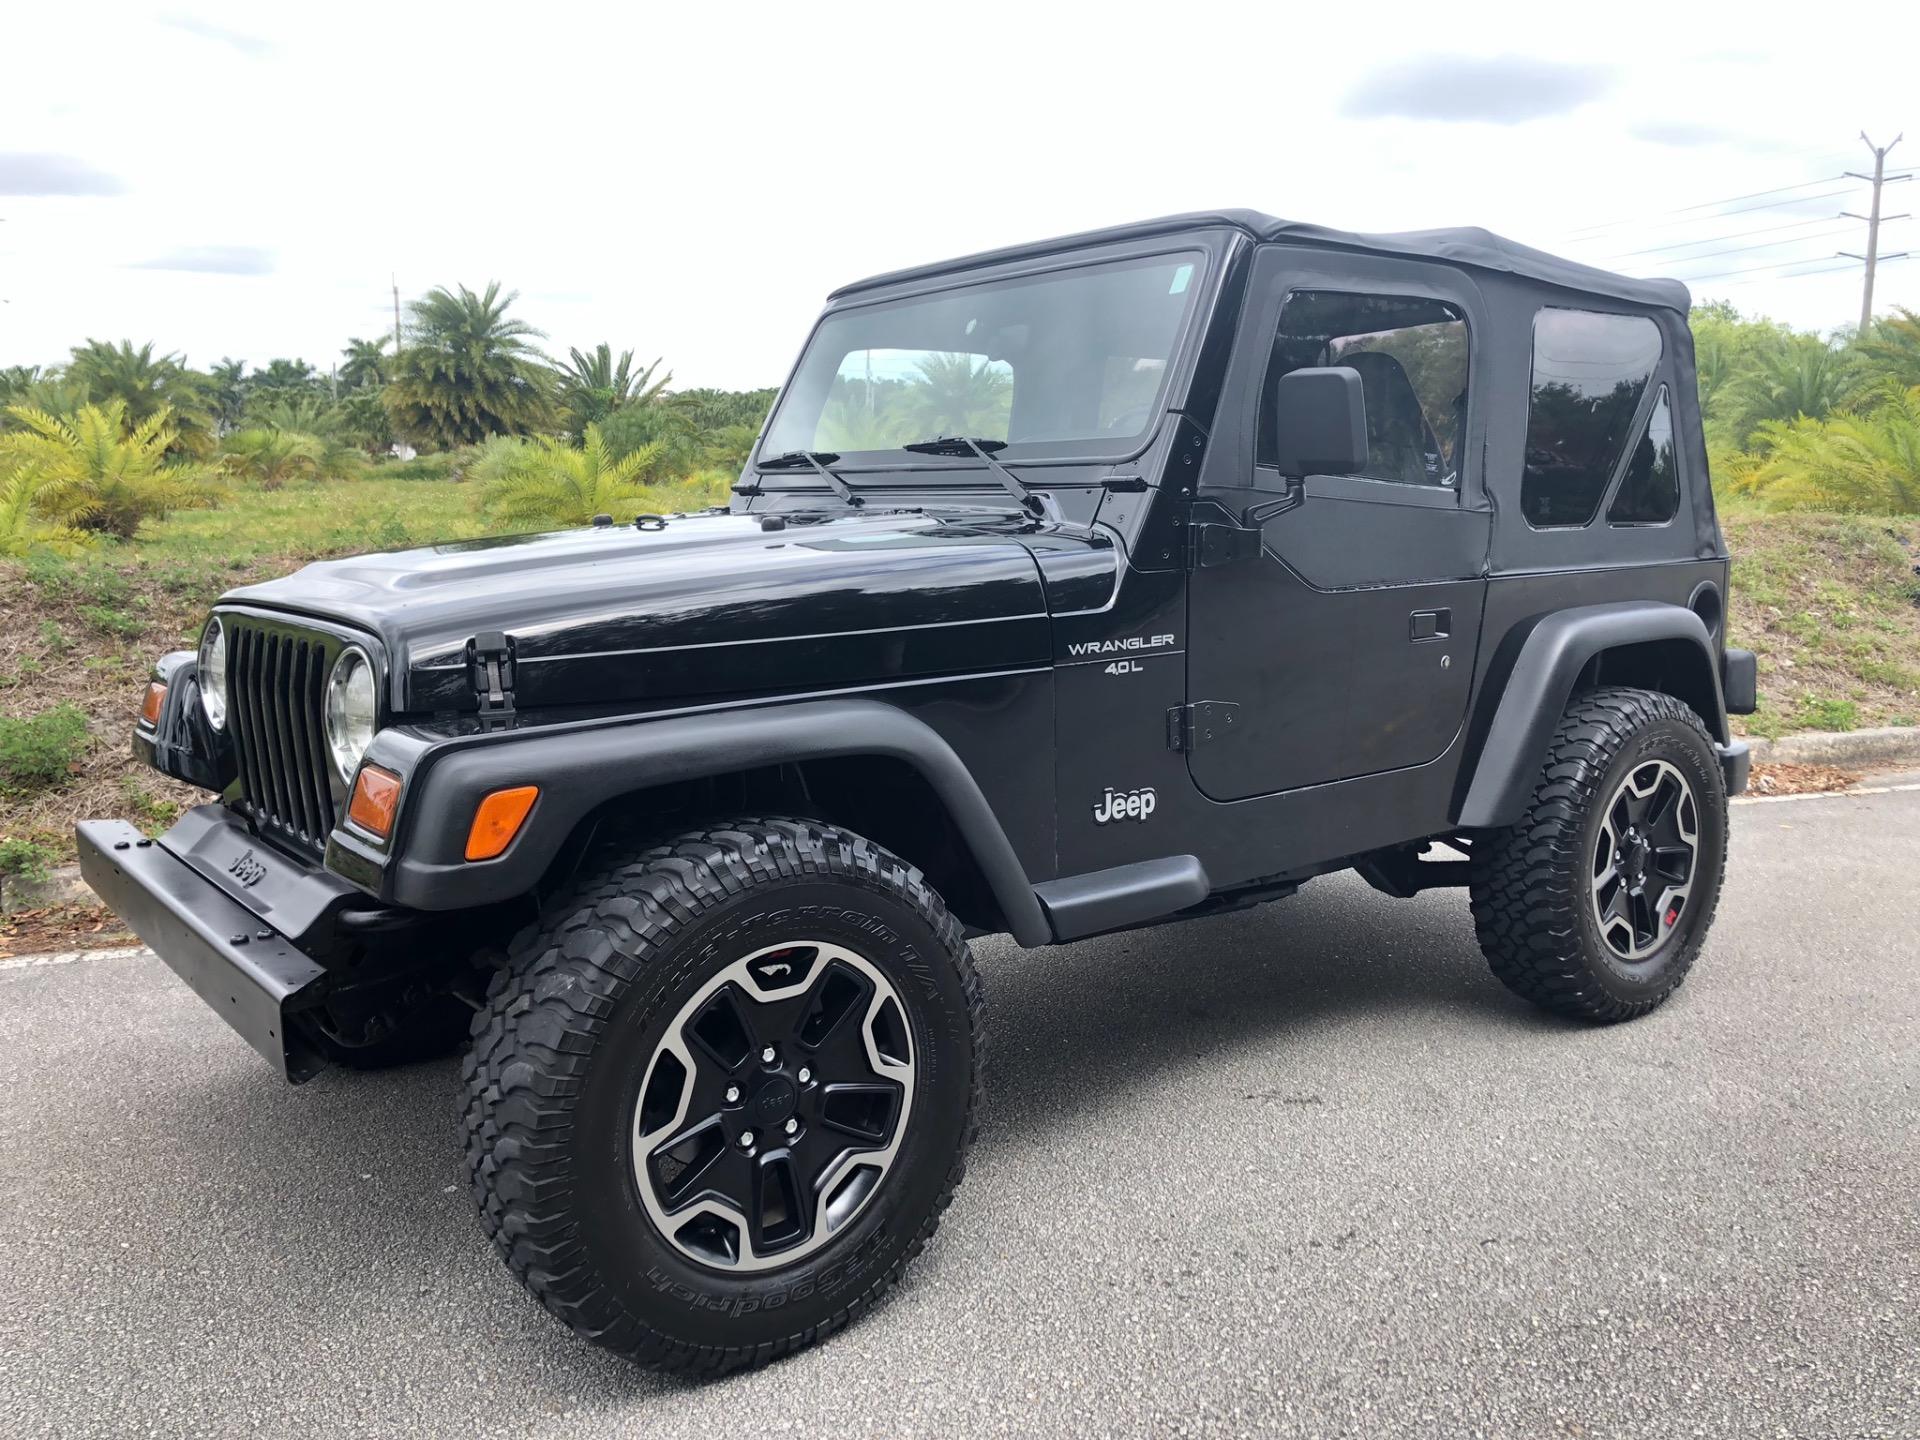 Used-1997-Jeep-Wrangler-Sport-Automatic-Sport